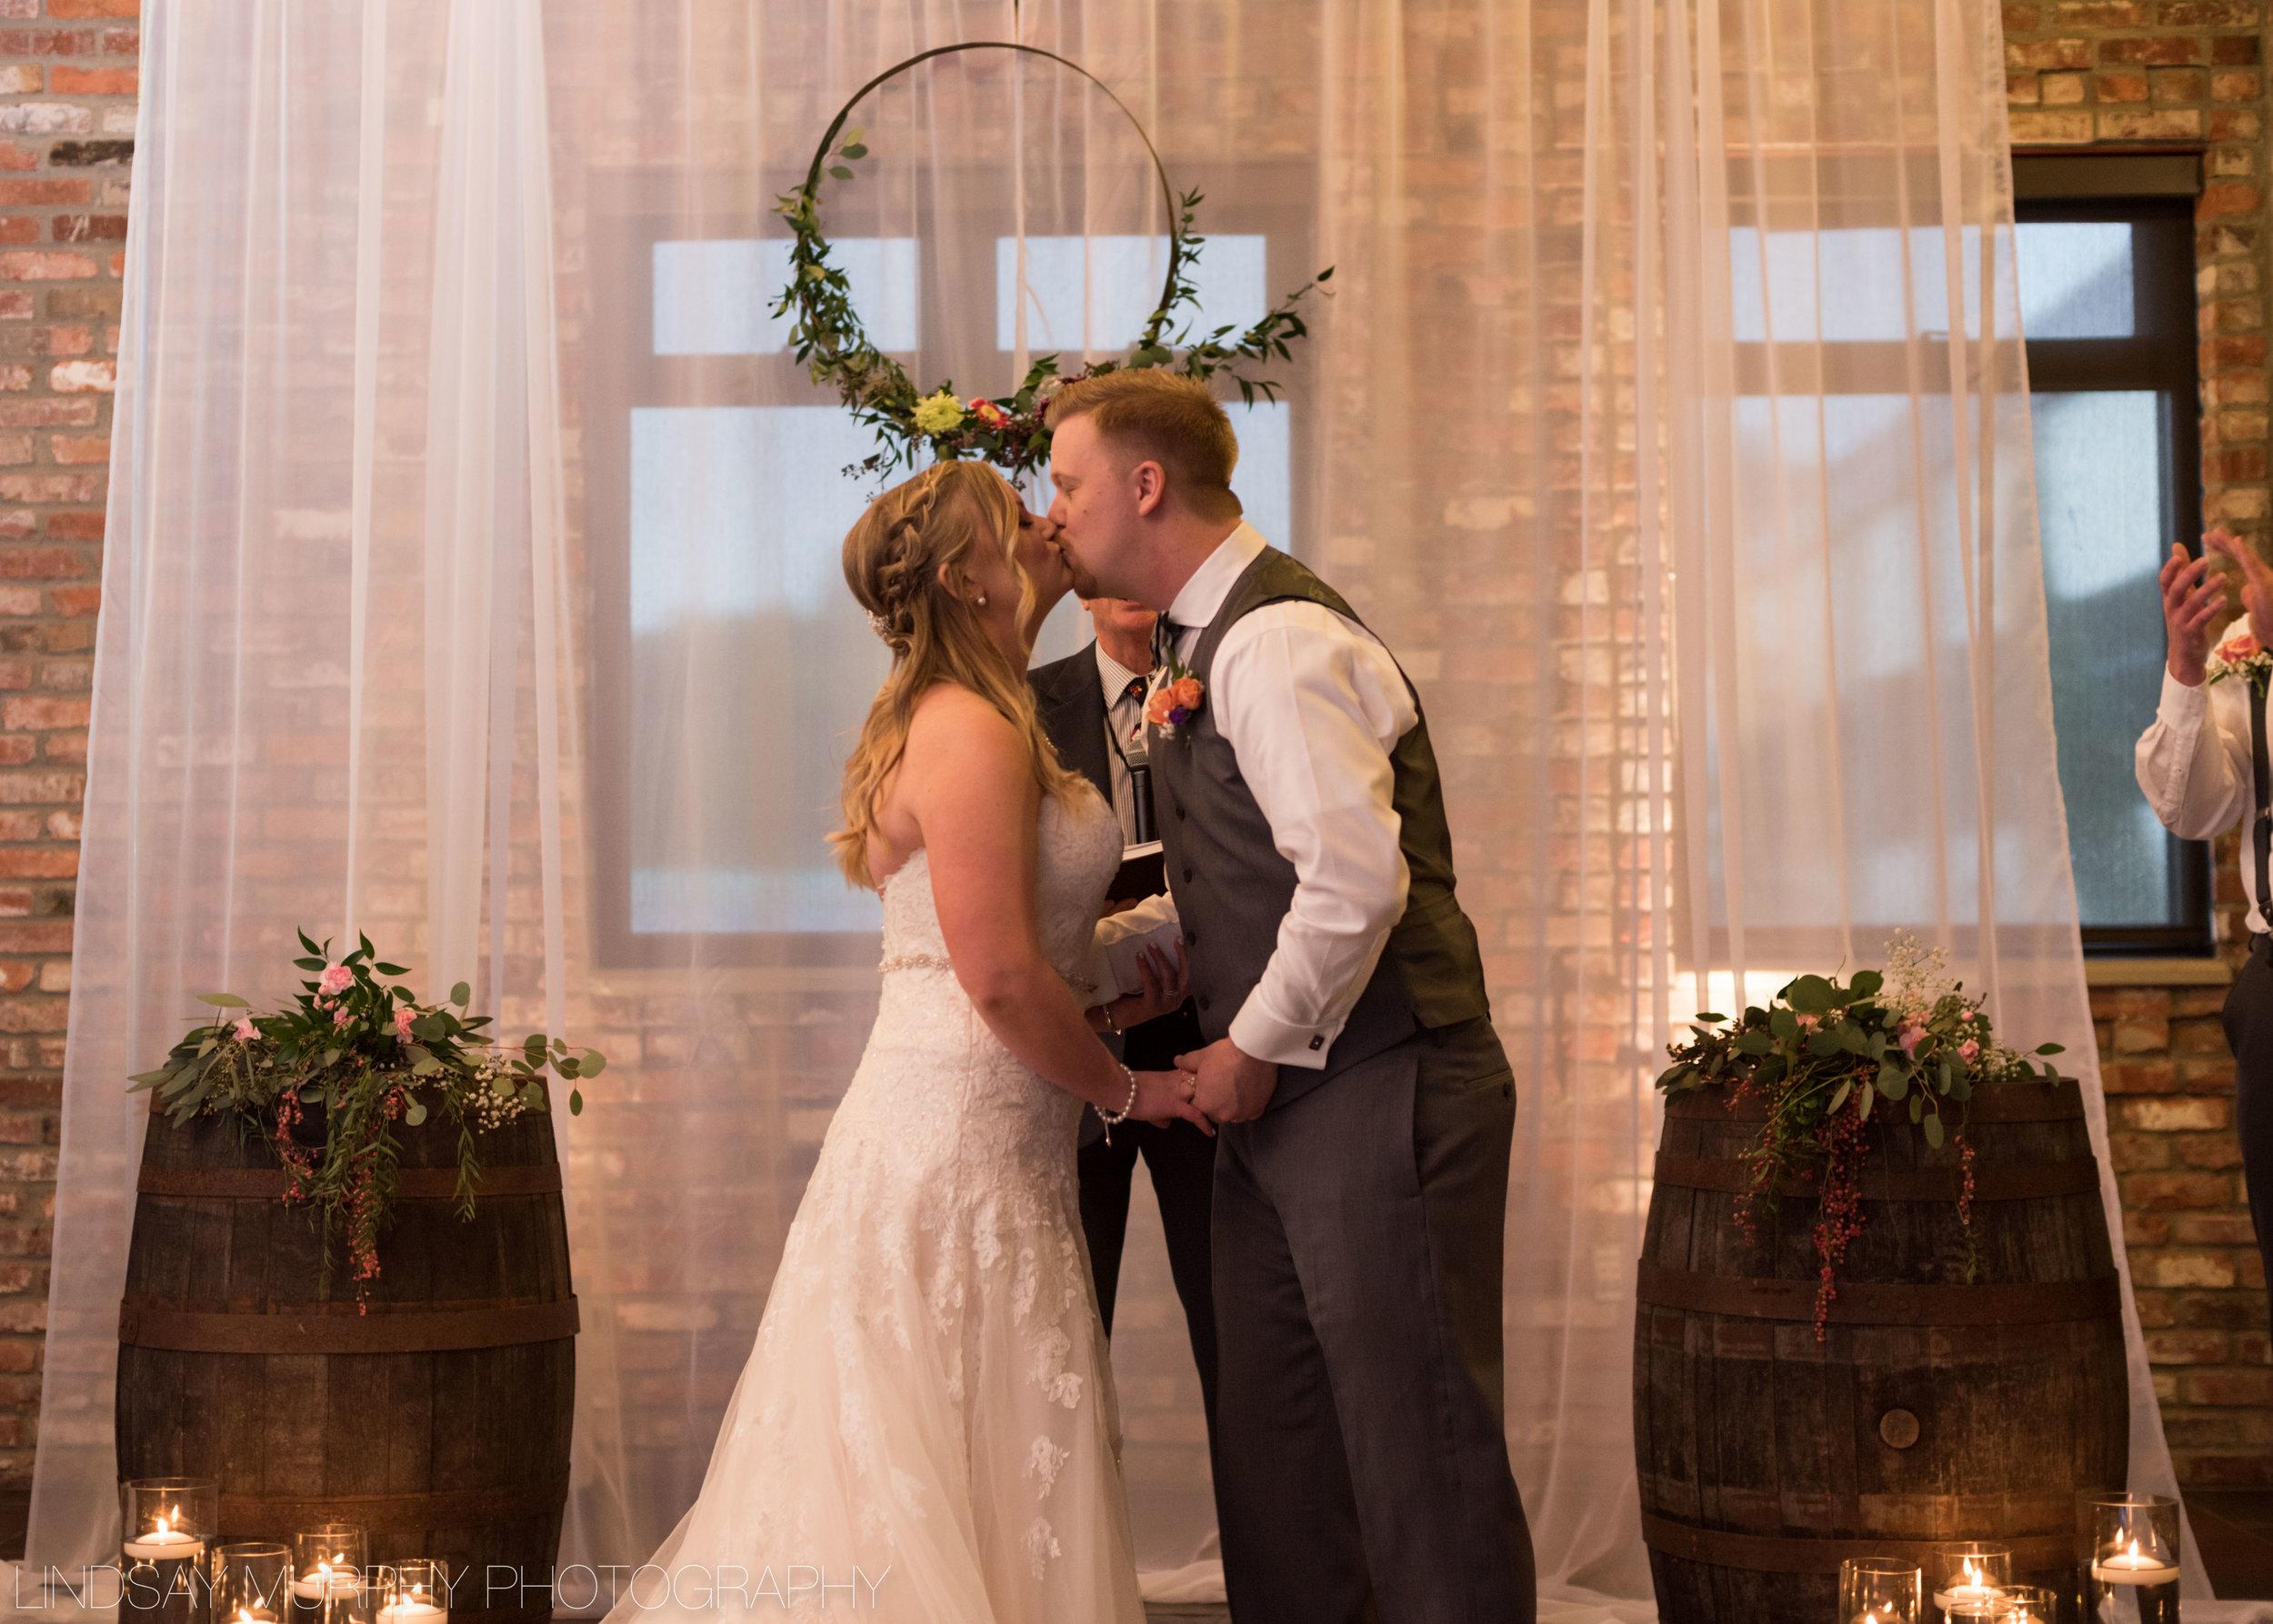 Tacoma_Wedding_photography-16.jpg